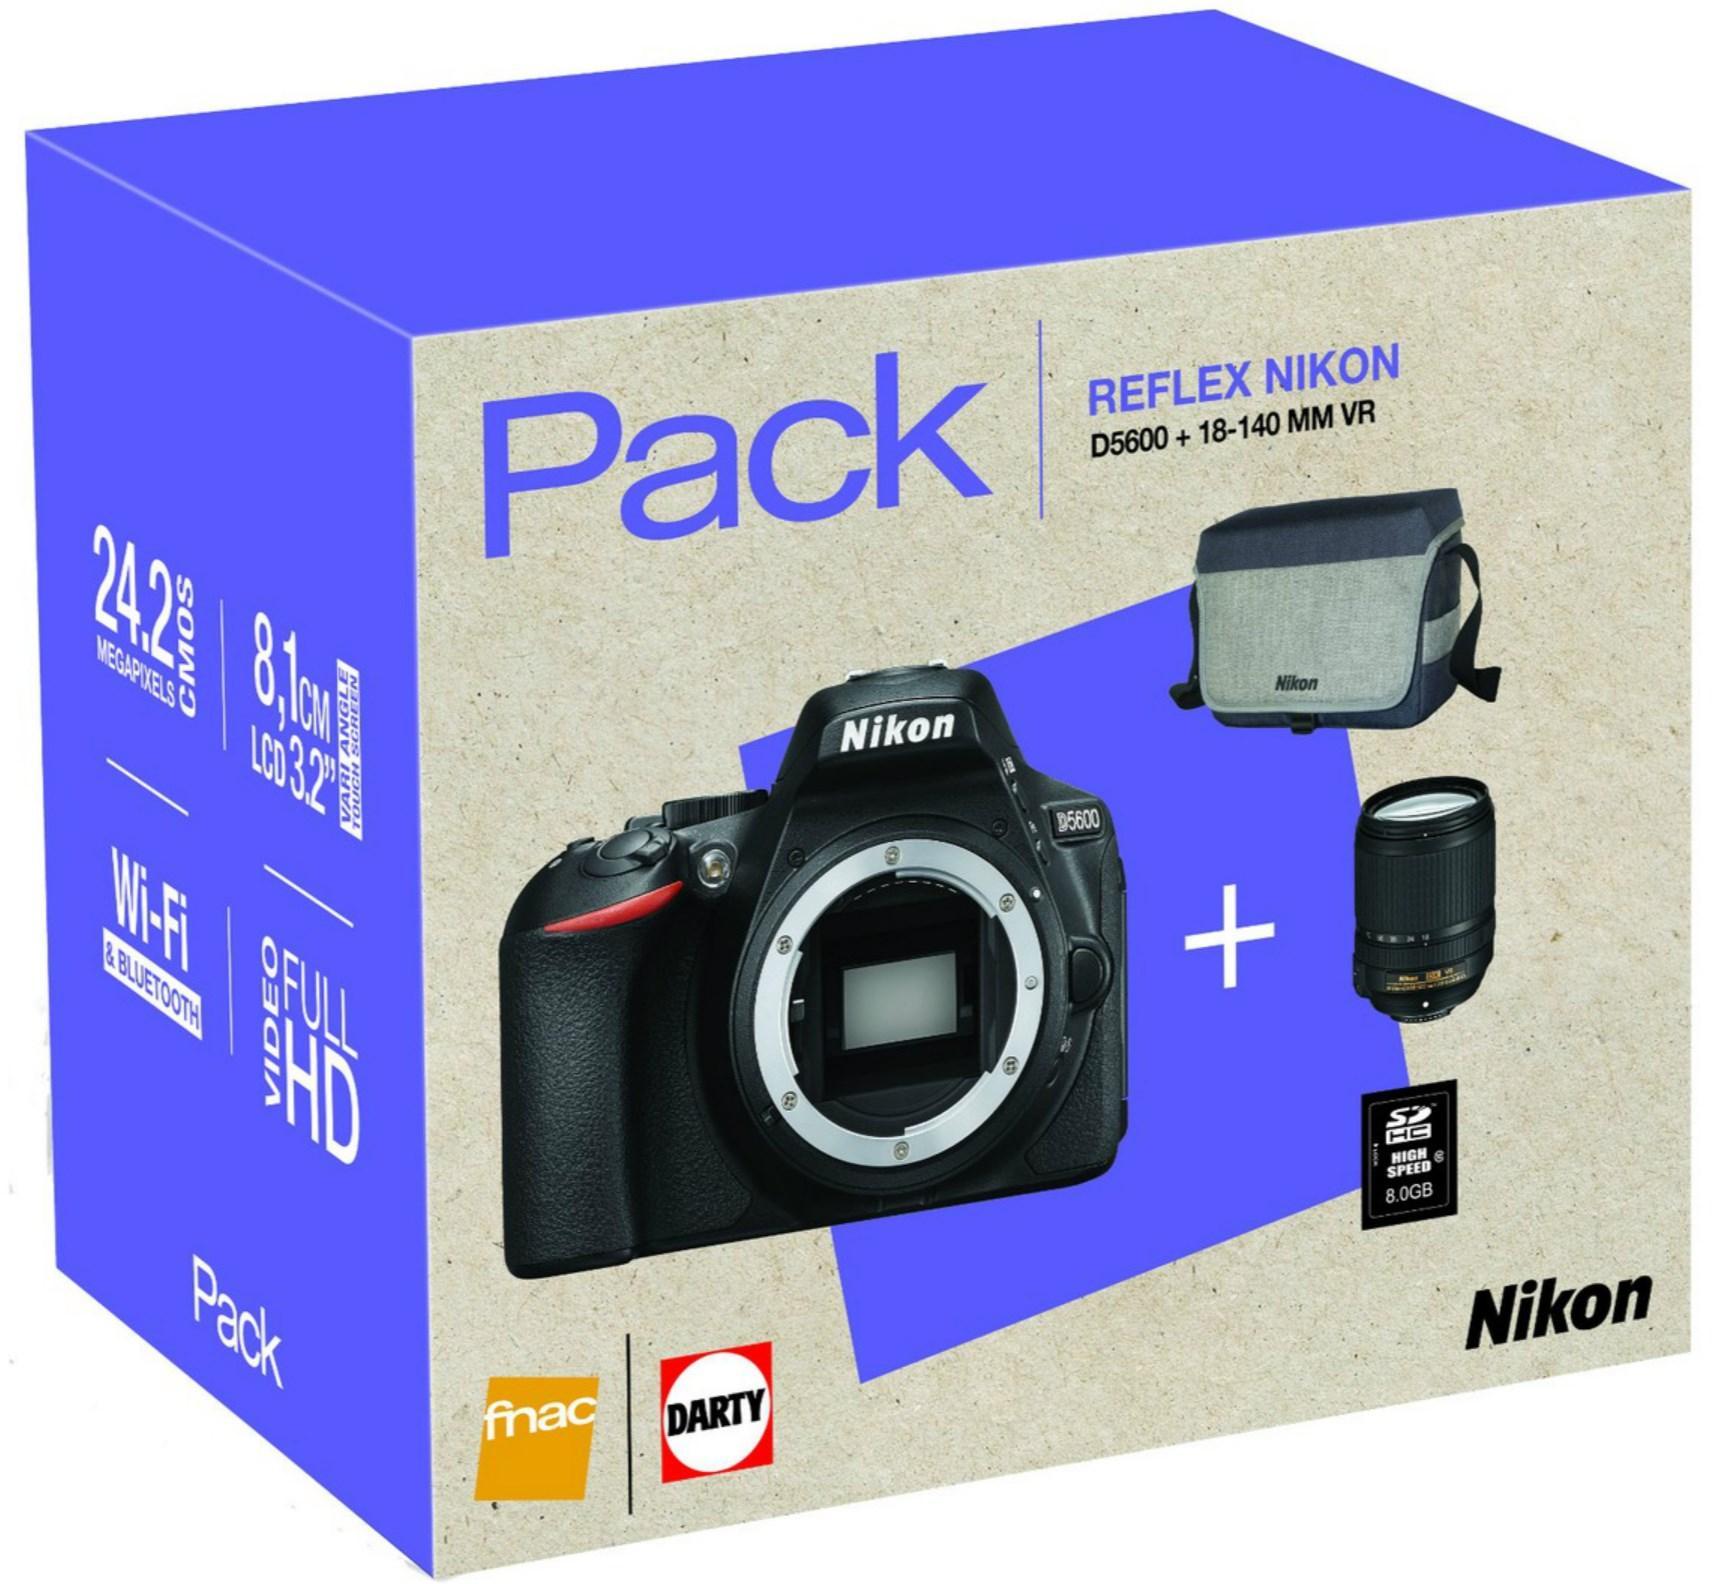 Appareil photo Reflex Nikon D5600 + Objectif Zoom 18-140 + Housse + Carte SD 8 Go